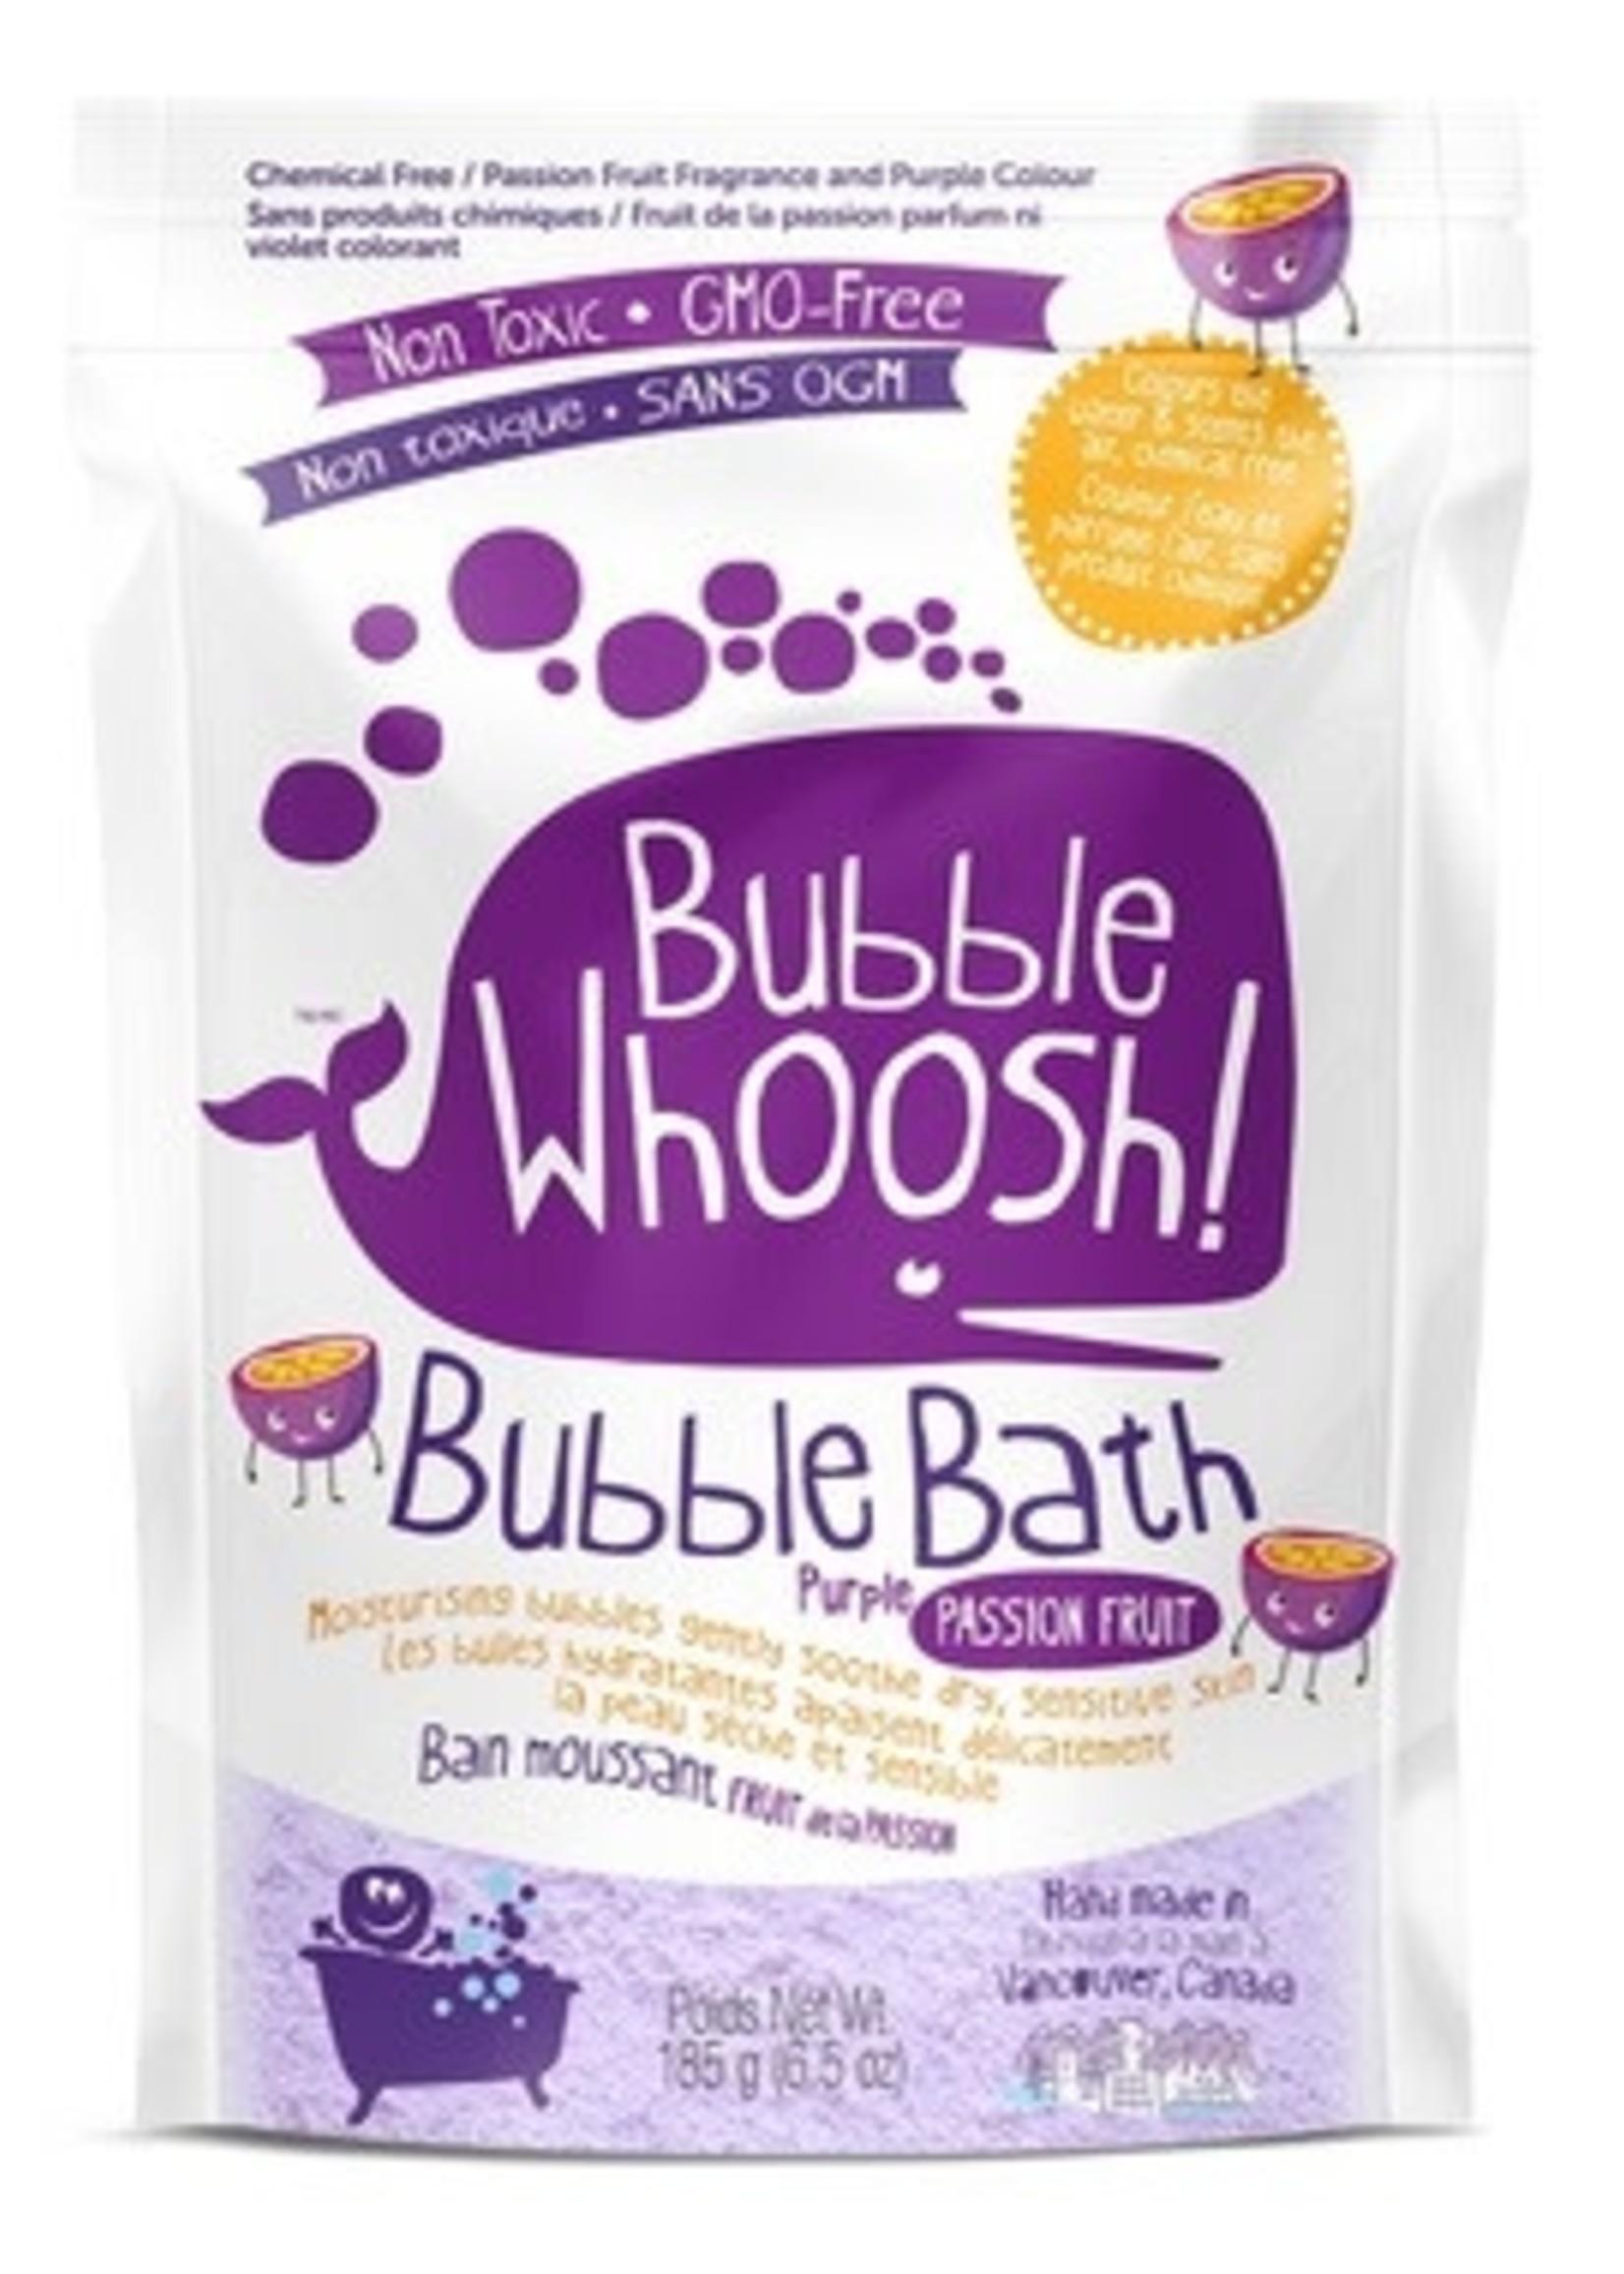 Bubble Whoosh Bubble Whoosh Bubble Bath (Passion Fruit)